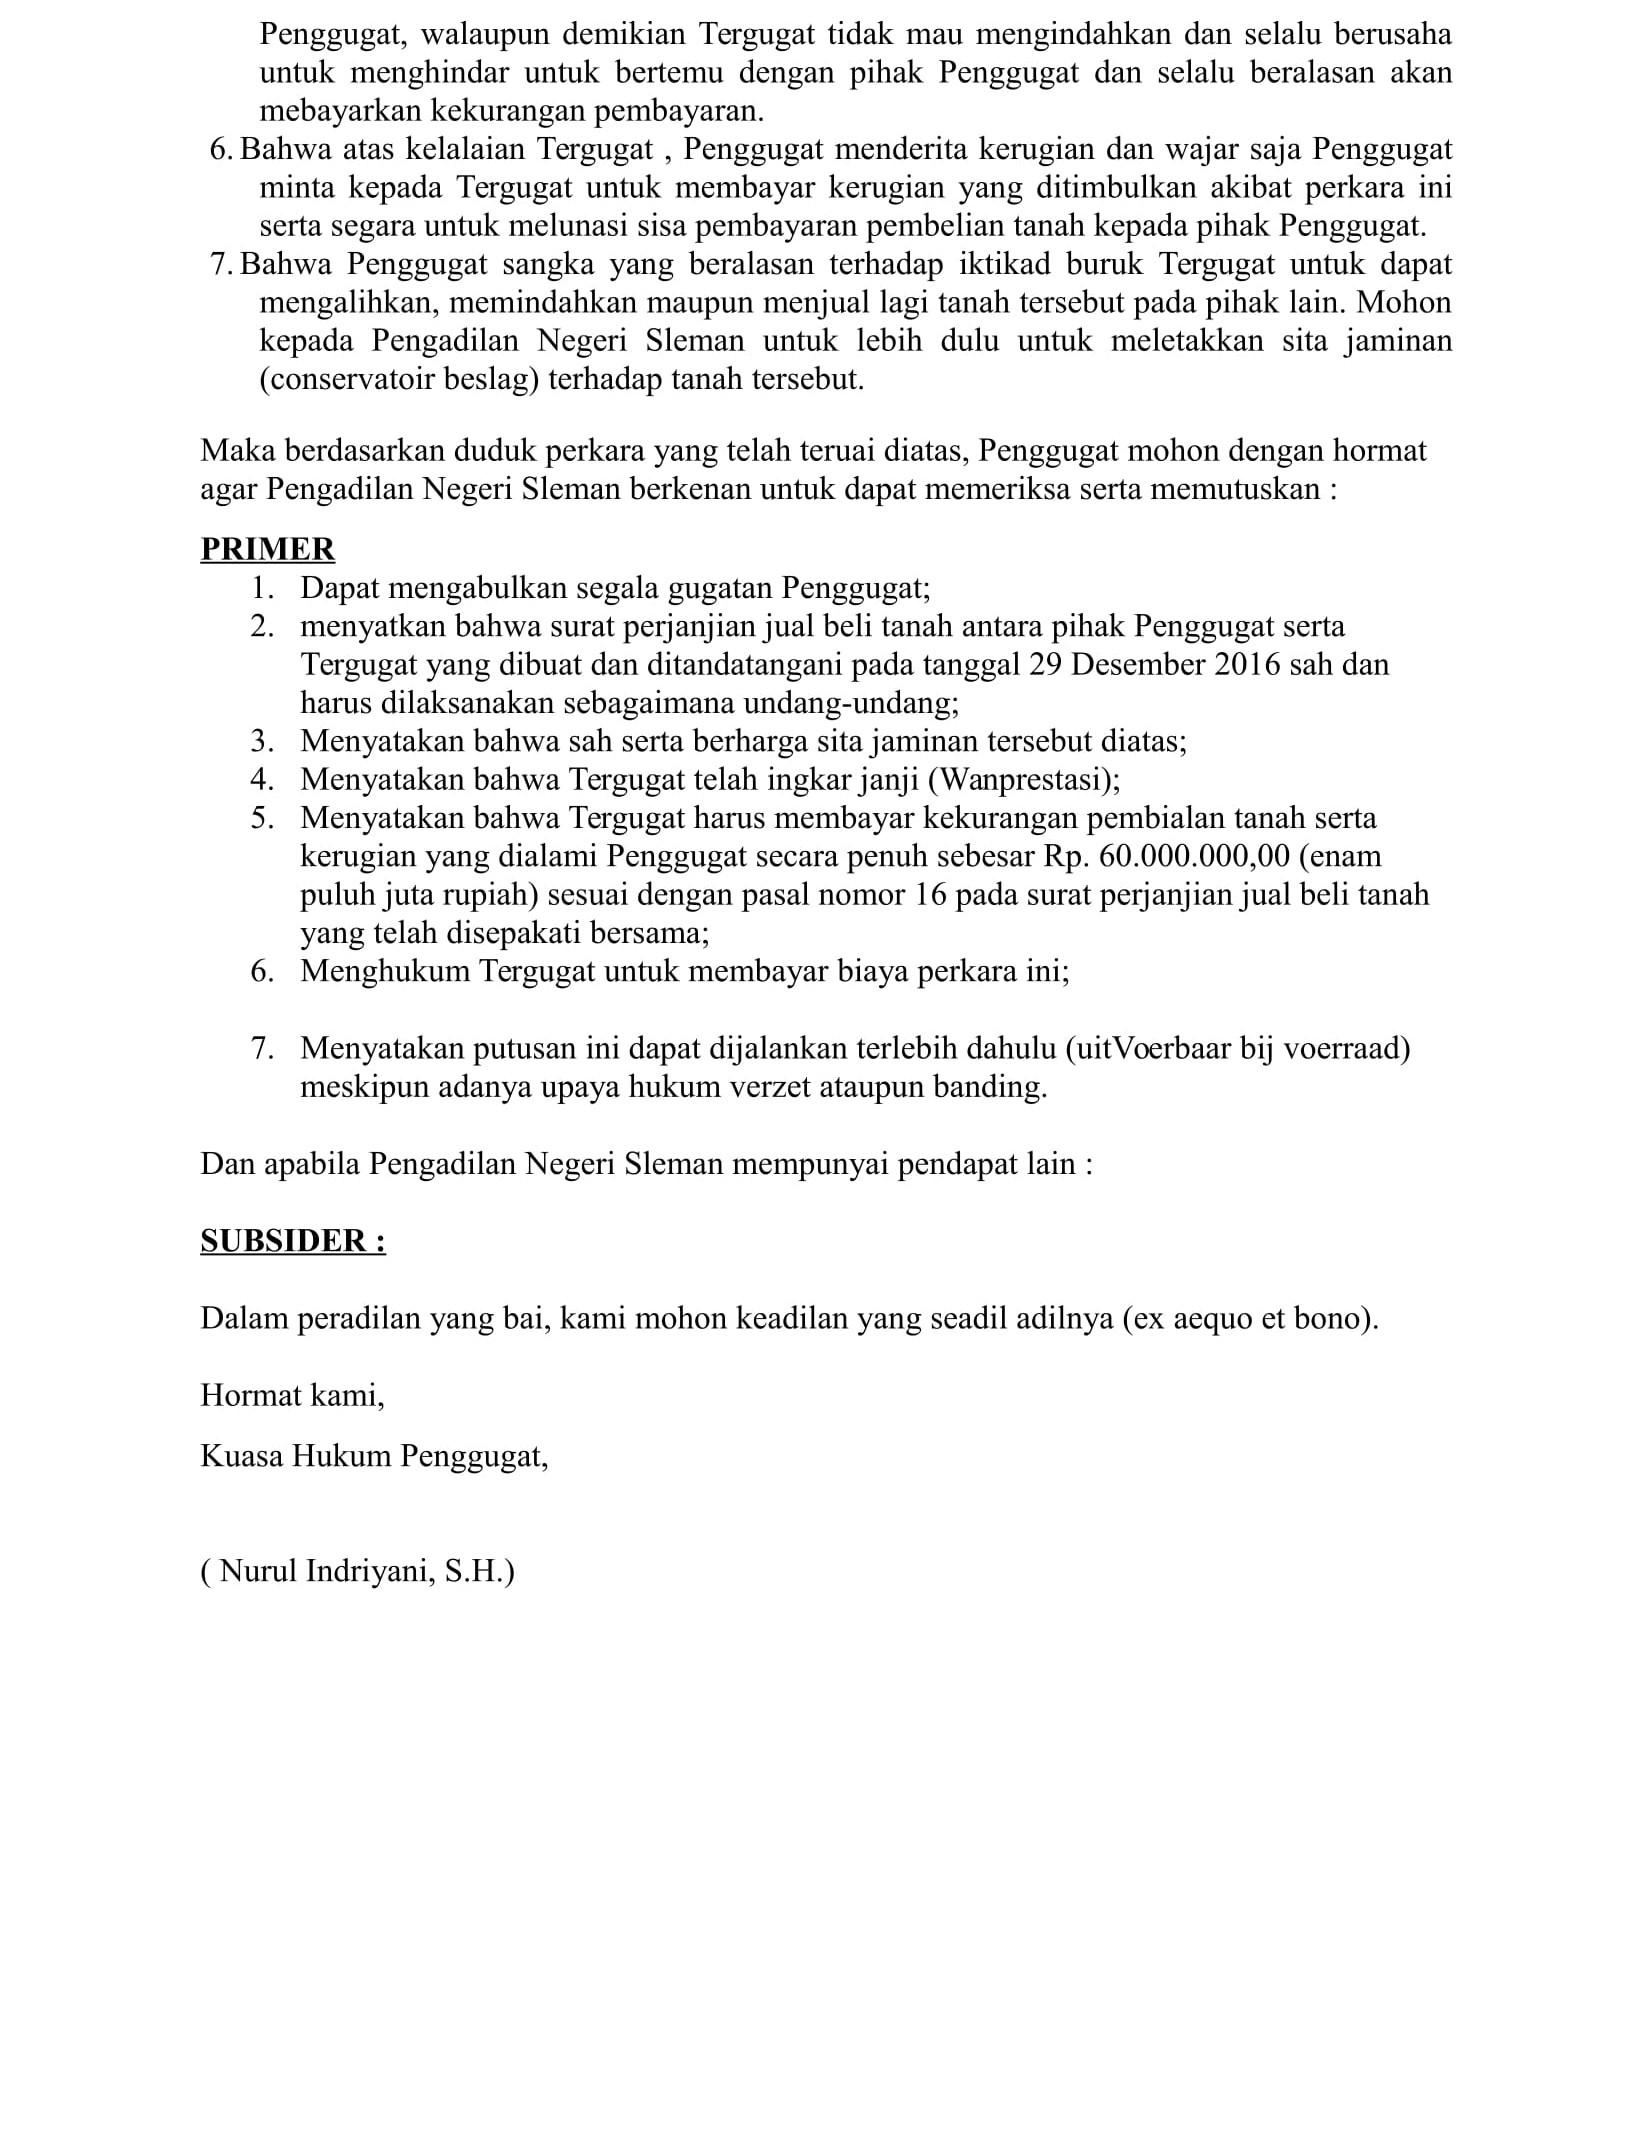 Contoh Surat Gugatan Perdata Sengketa Tanah Pdf Doylc Asia